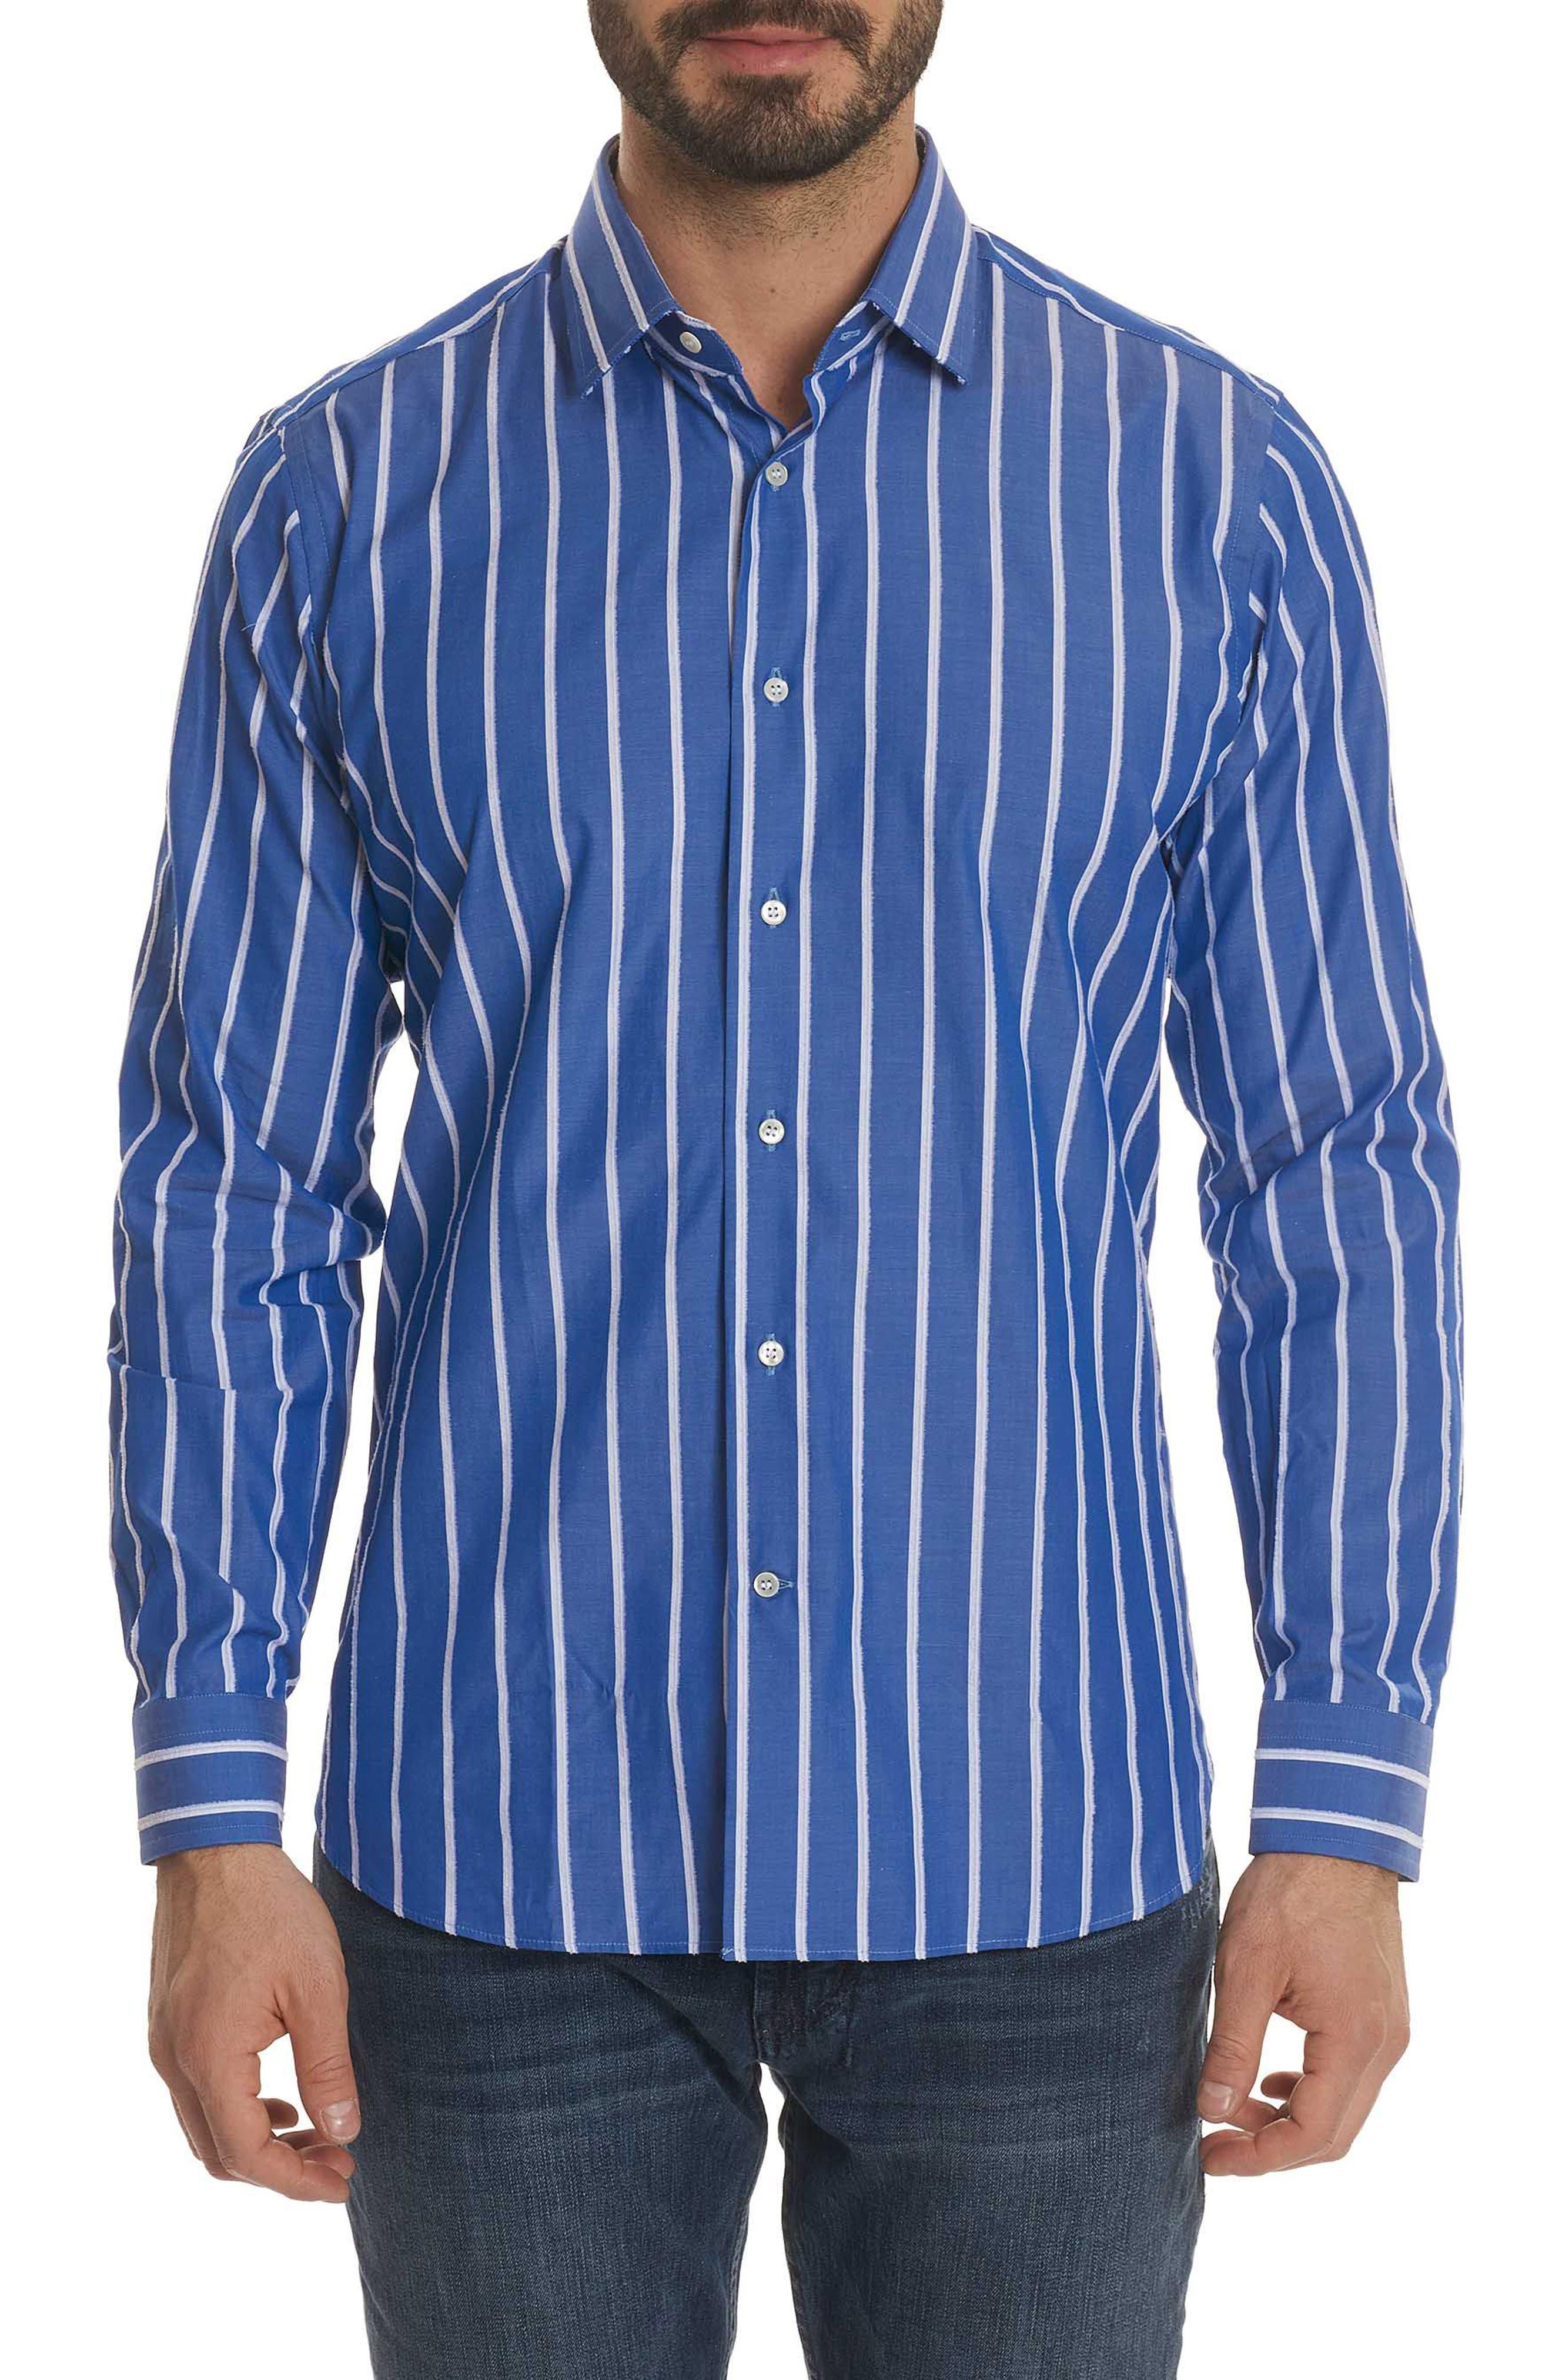 Massimo Regular Fit Stripe Sport Shirt,                             Main thumbnail 1, color,                             400